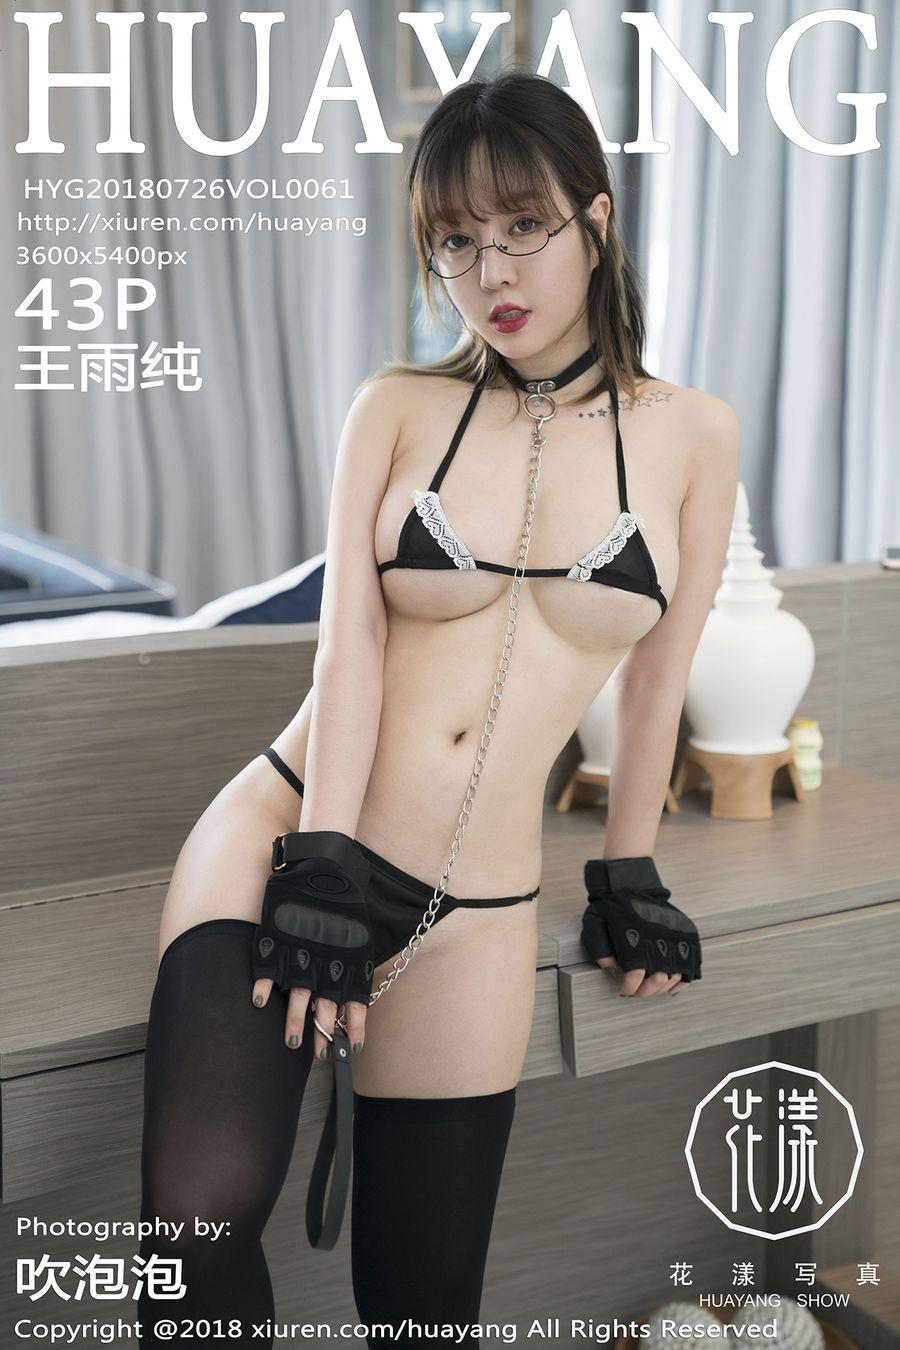 [HuaYang花漾] VOL.061 王雨纯 [43+1P/126M]